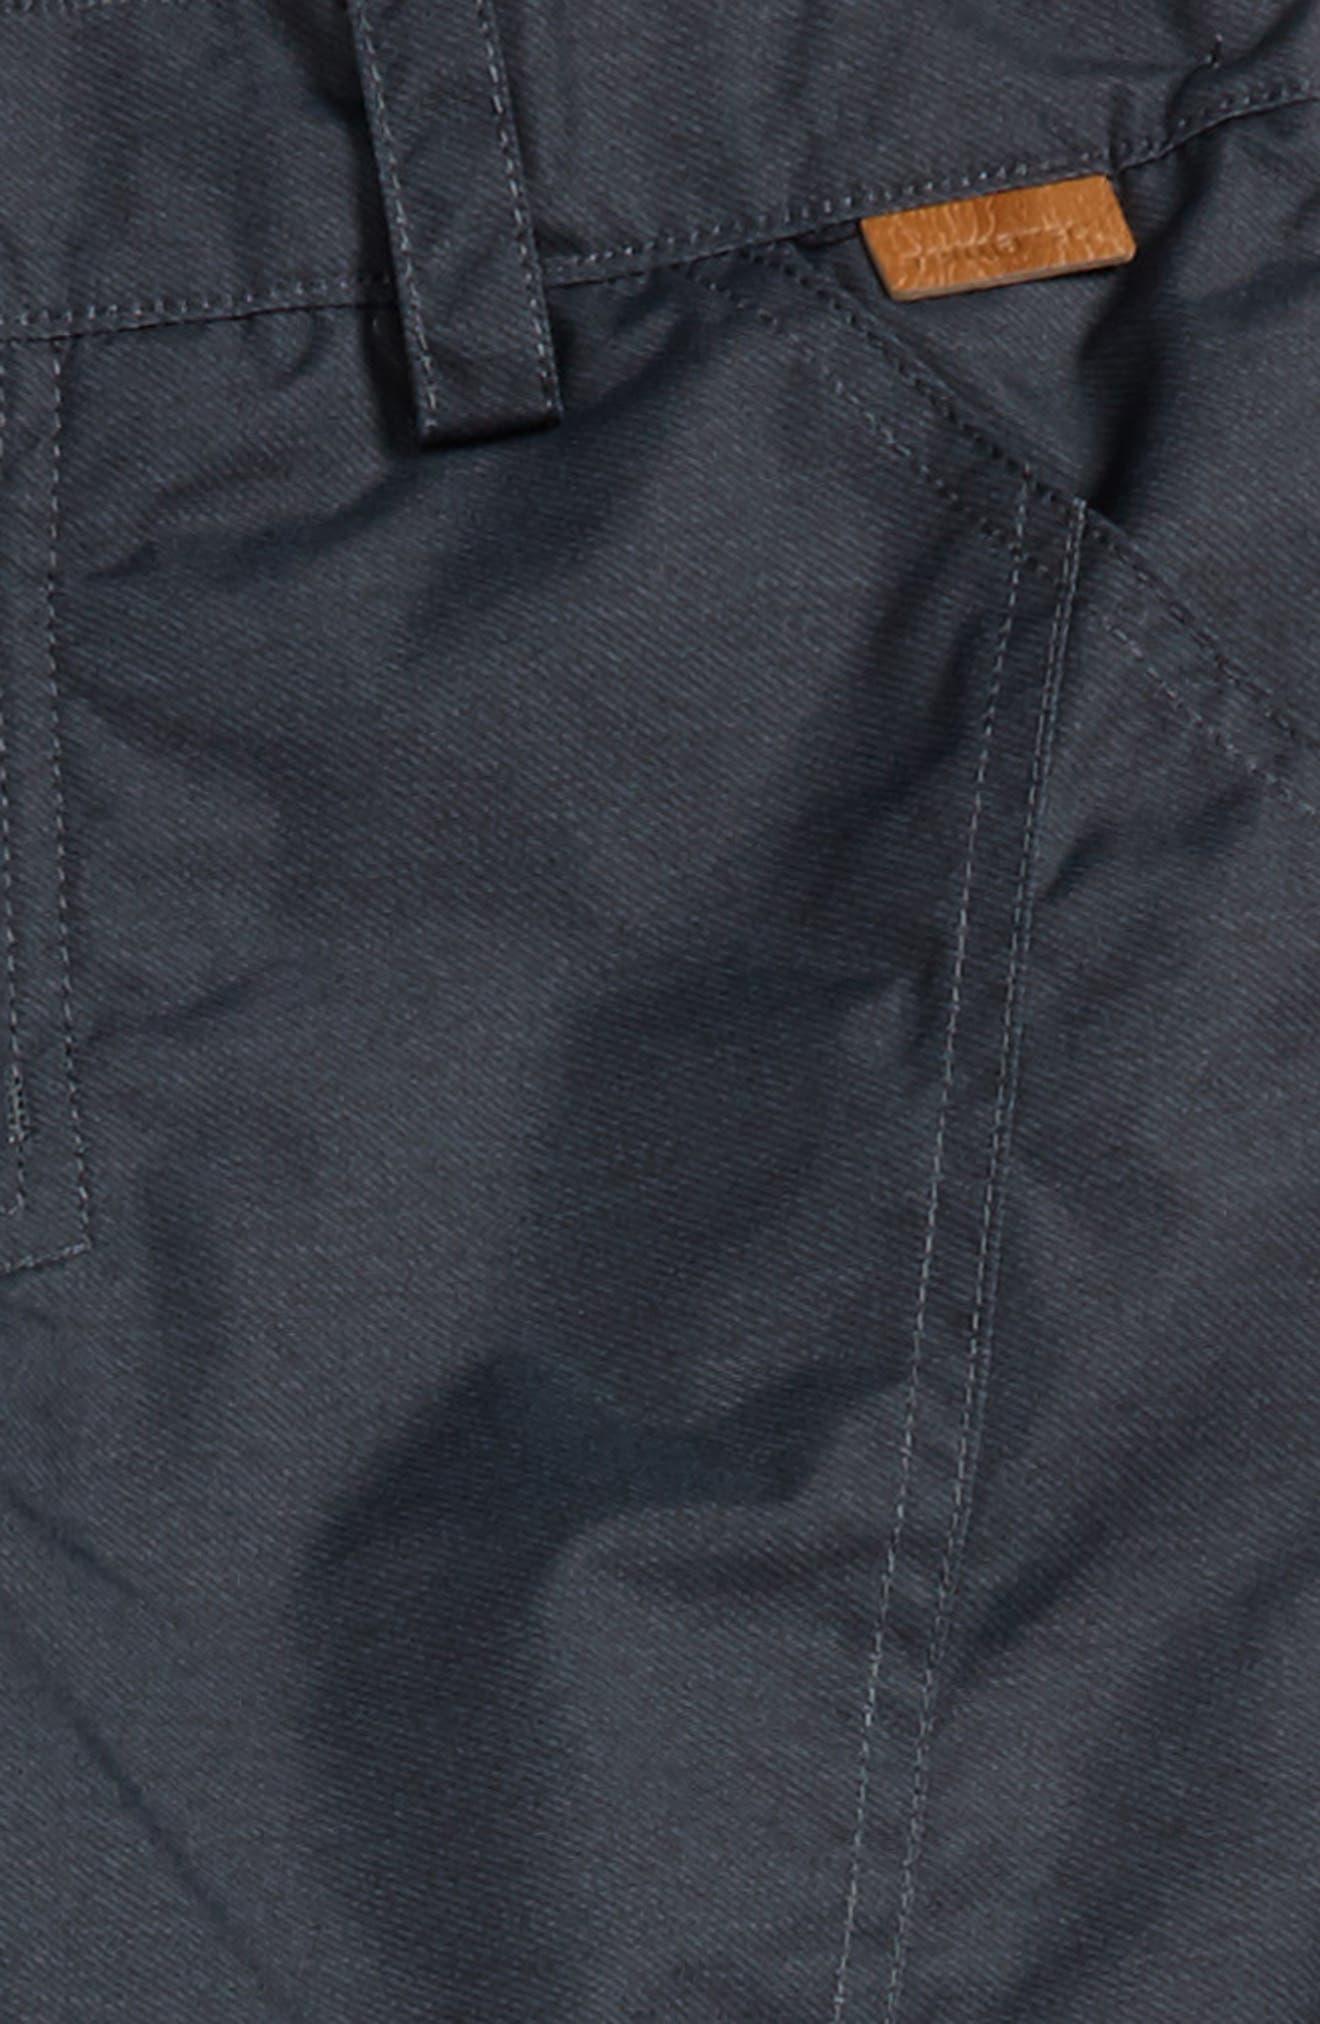 Reimatec<sup>®</sup> Waterproof Pants,                             Alternate thumbnail 2, color,                             021